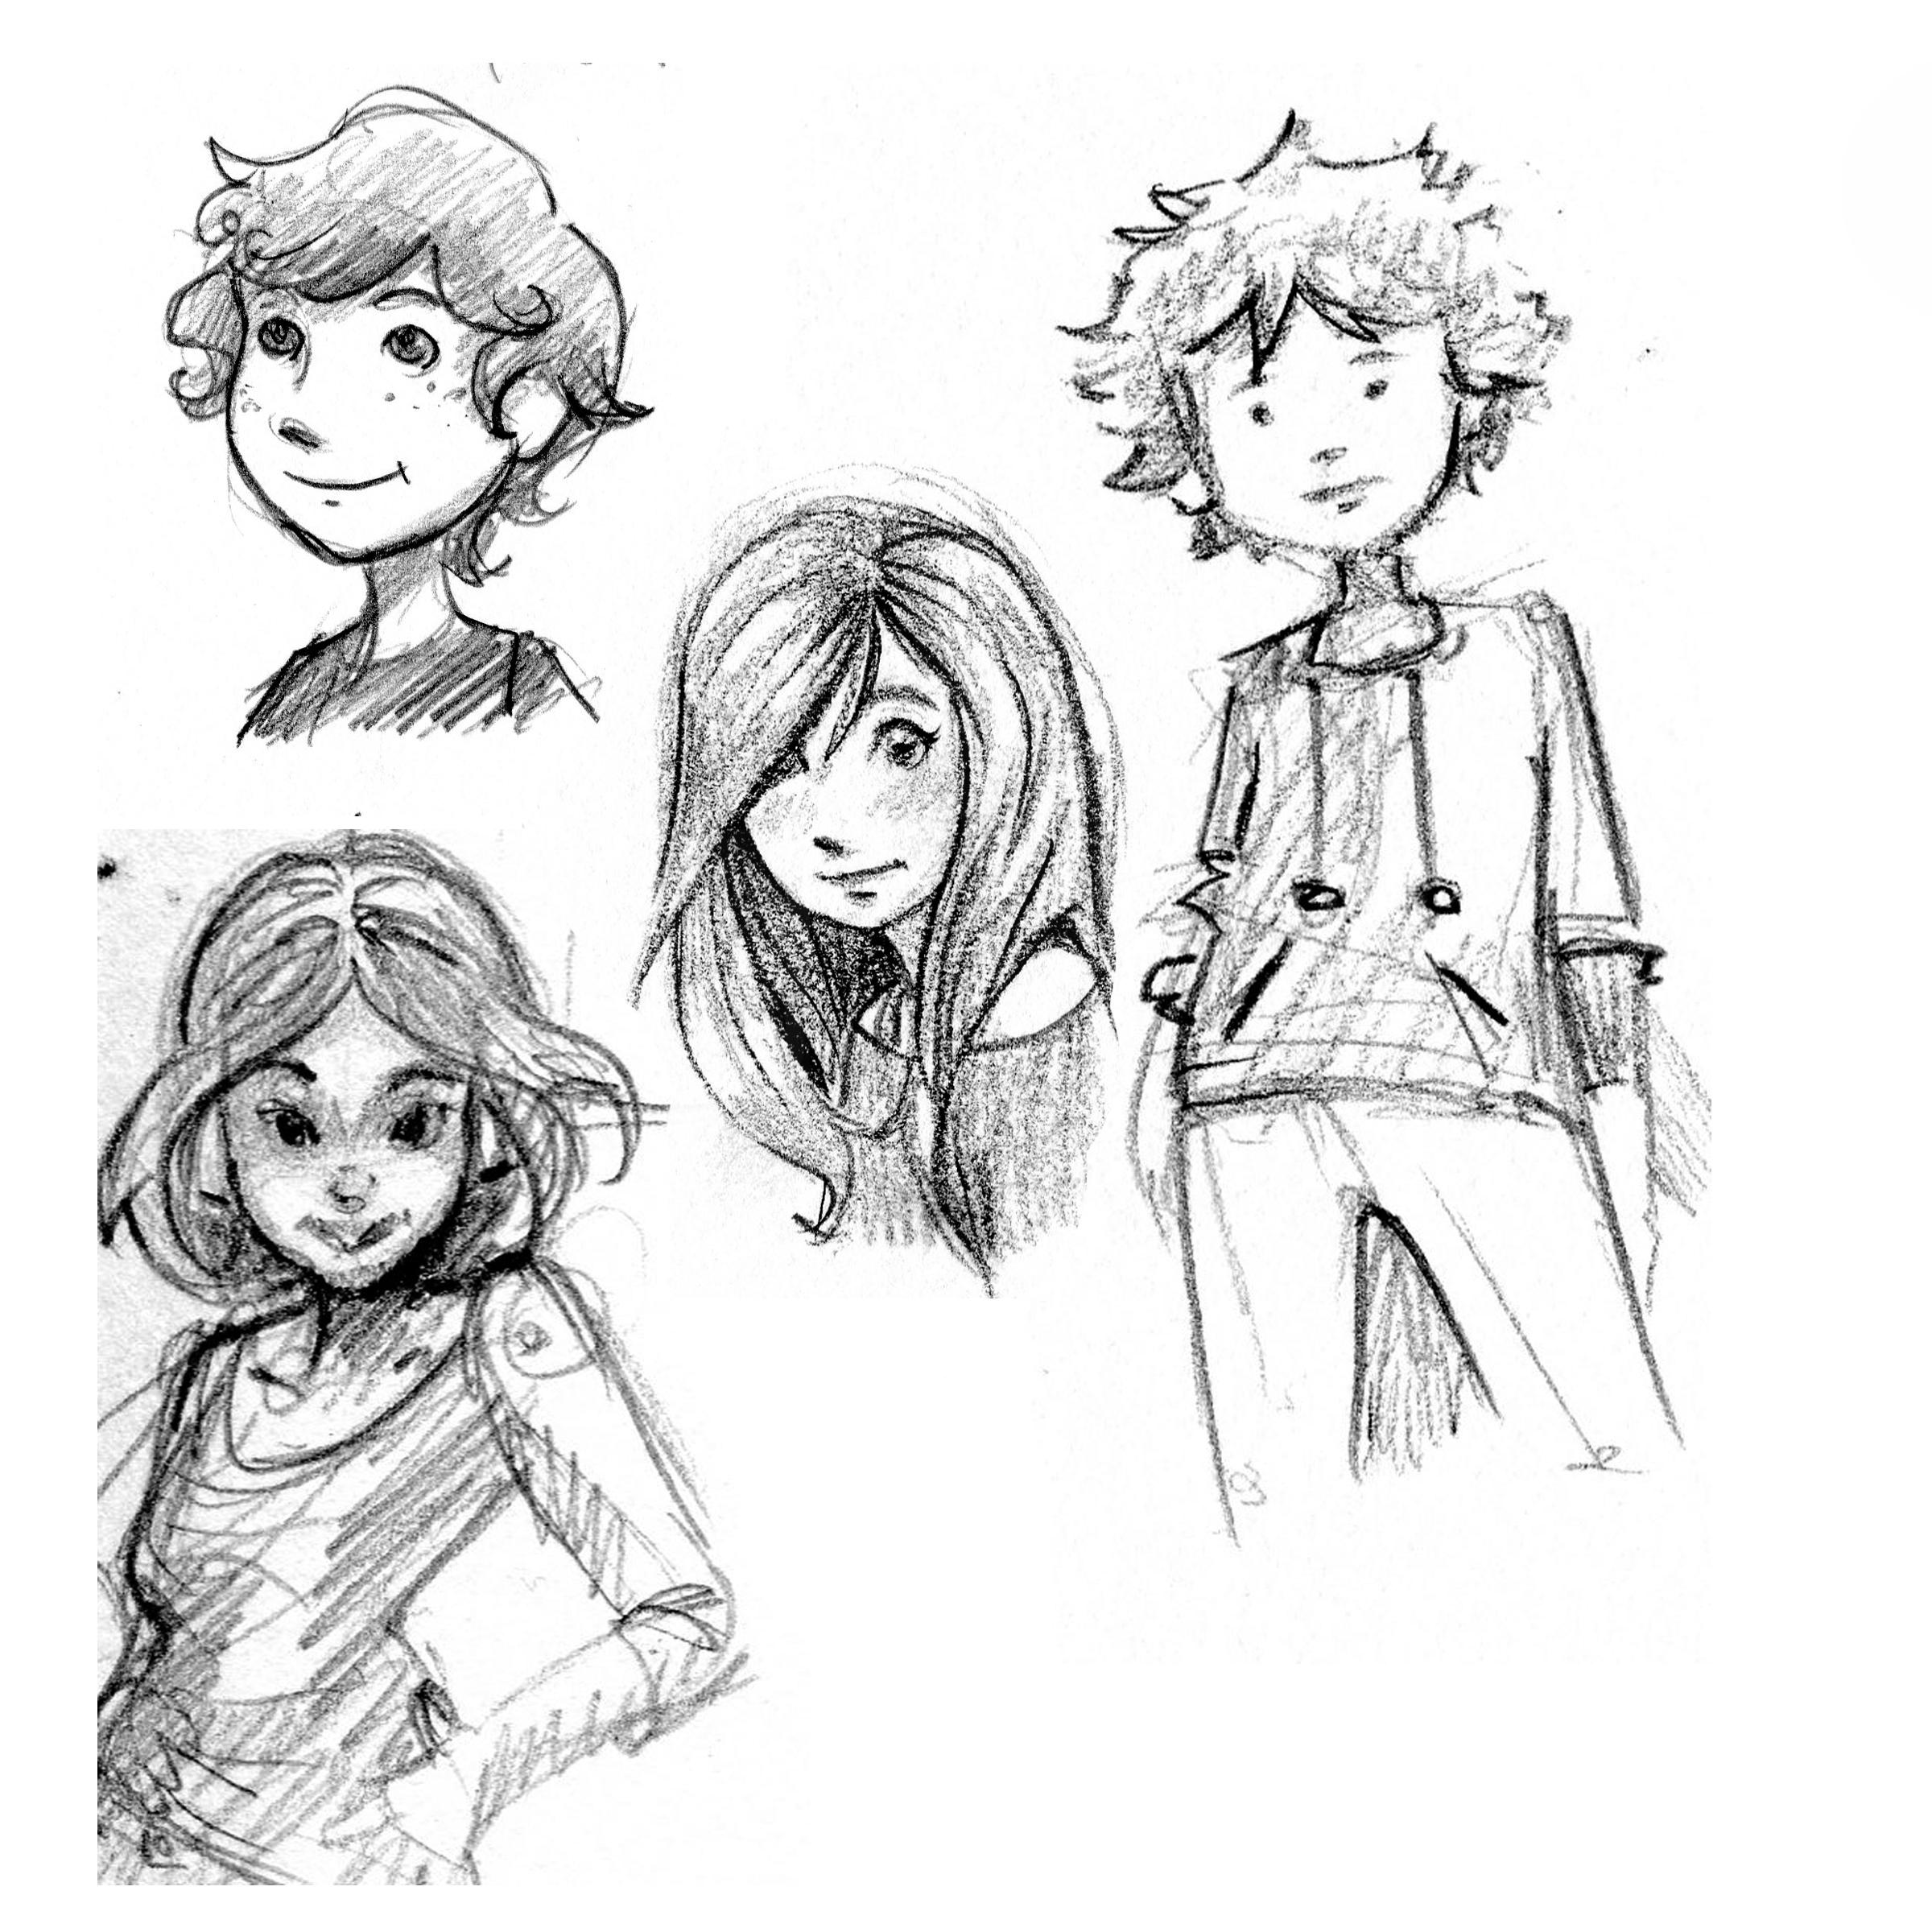 characterstudy